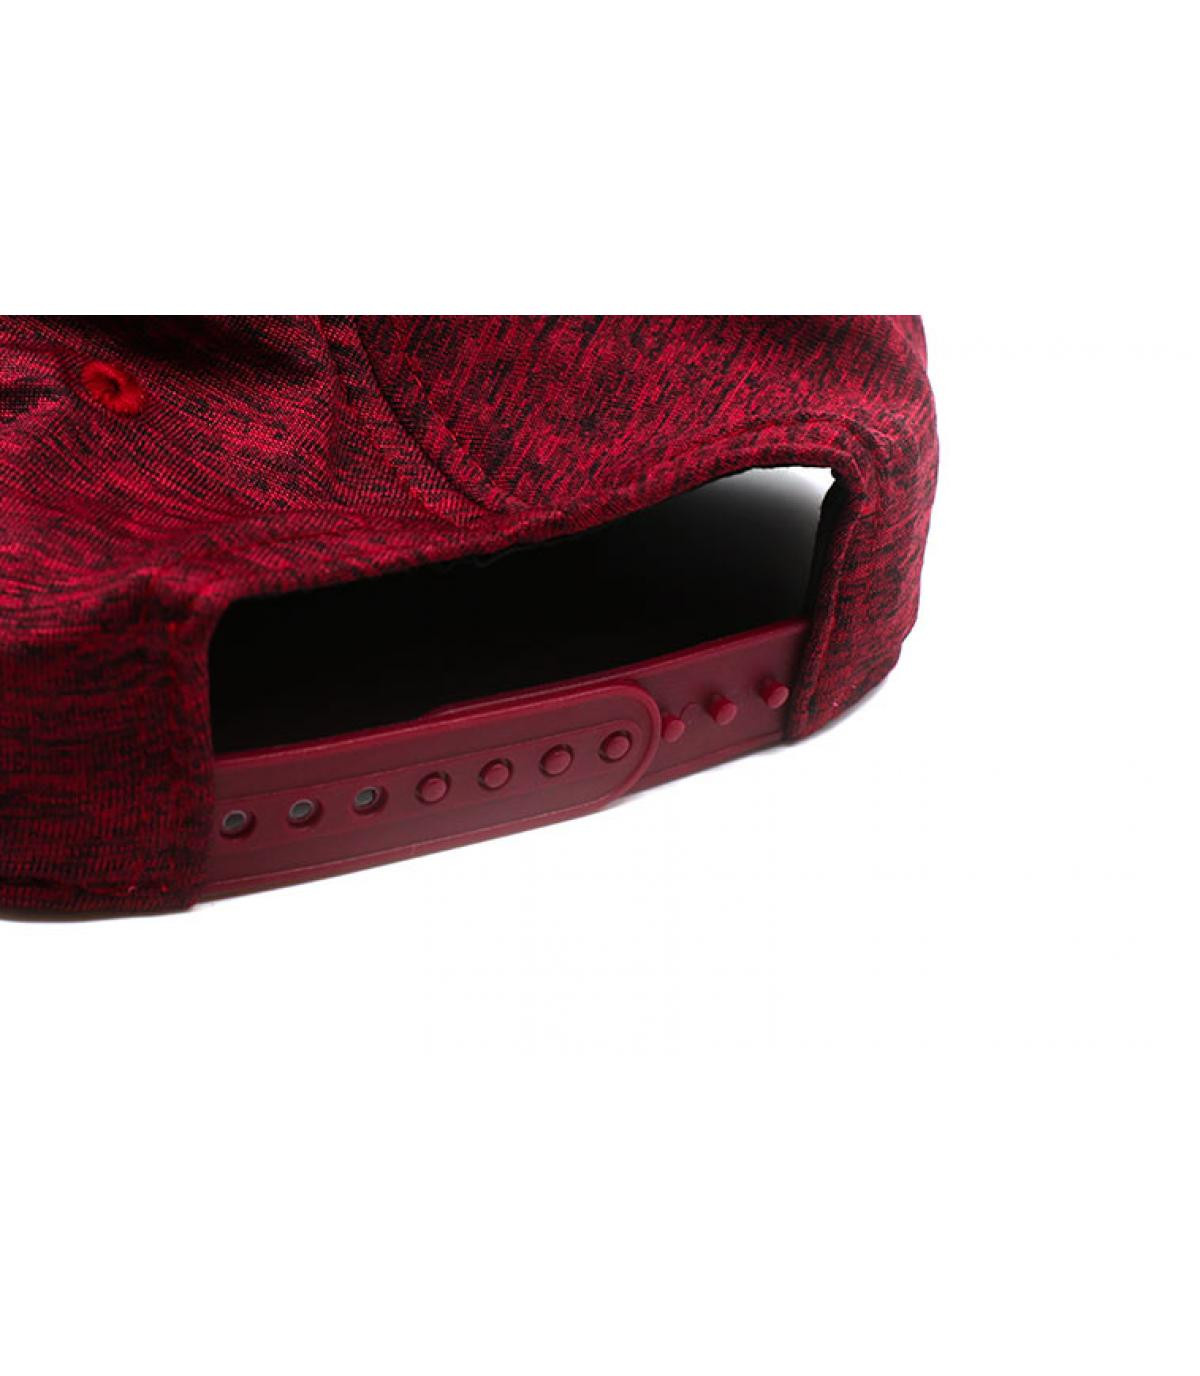 Details Snapback Dry Switch Boston 9Fifty cardinal - Abbildung 5